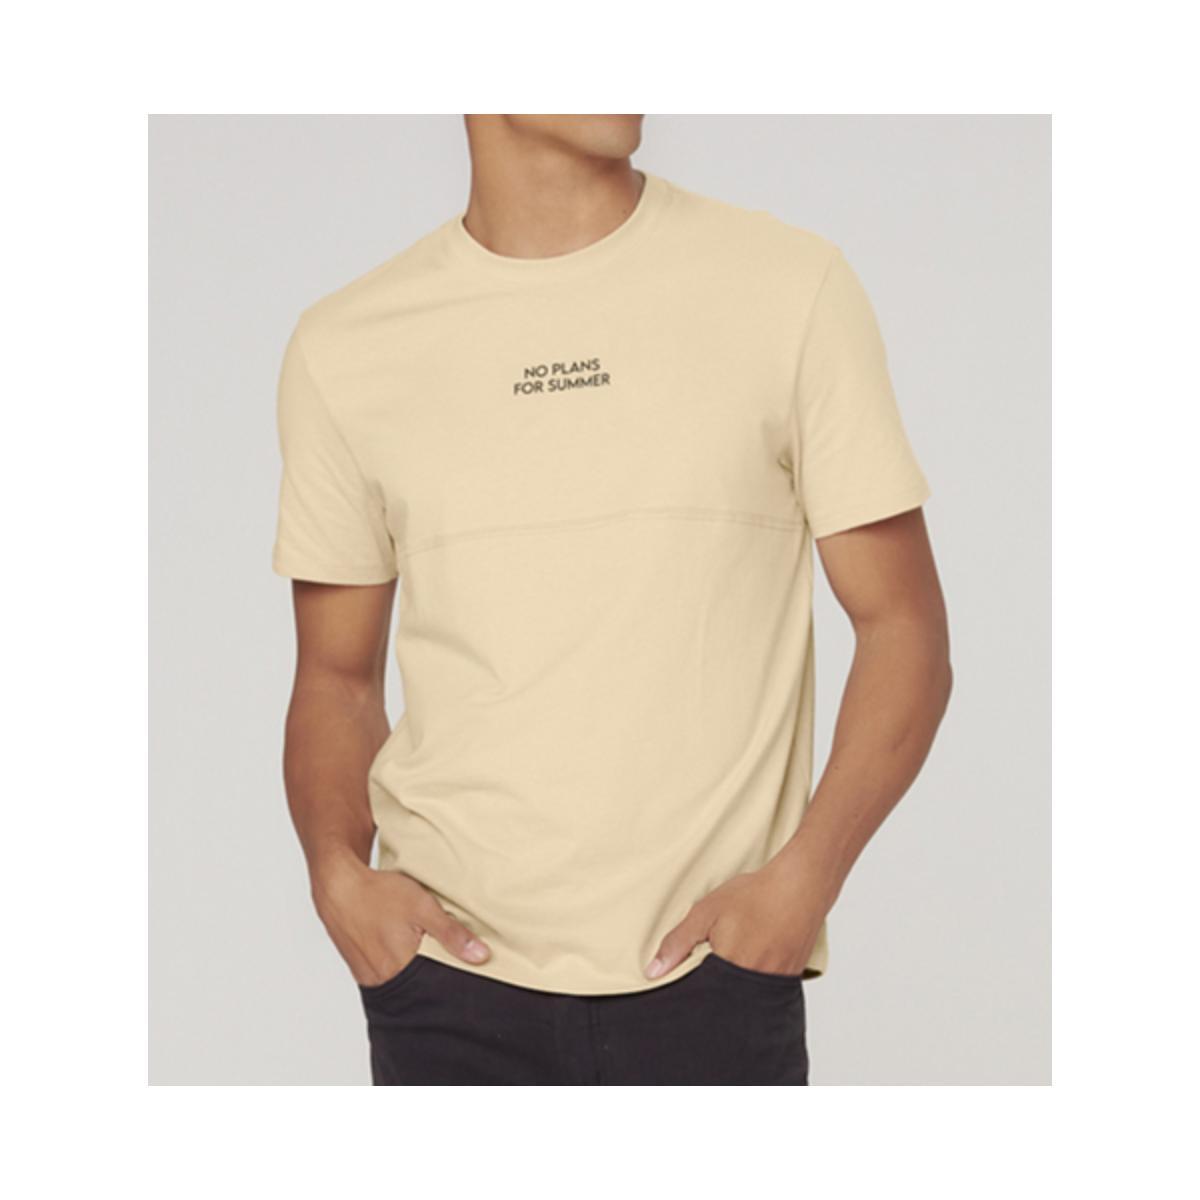 Camiseta Masculina Dzarm 6raz Hlken Bege